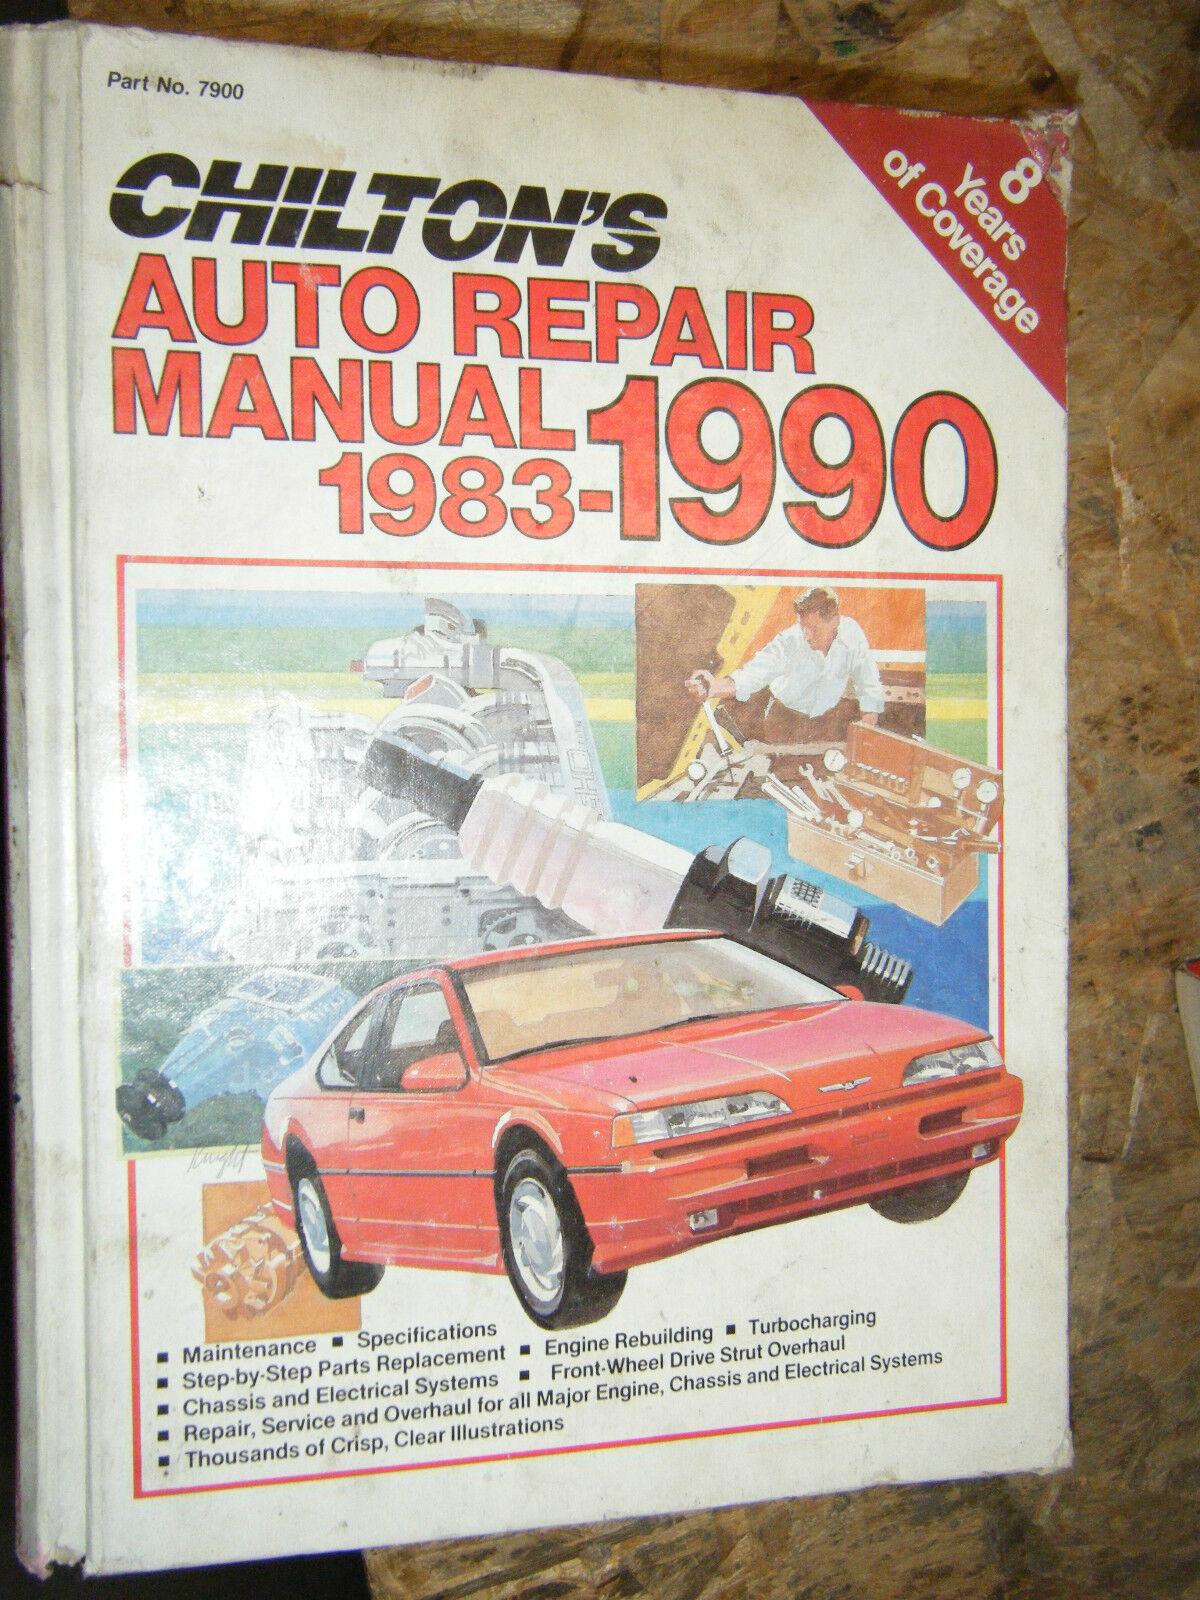 Chrysler magazine user manuals array 1990 chilton u0027s auto repair manual amc dodge chevy ford chrysler rh ebay com fandeluxe Gallery